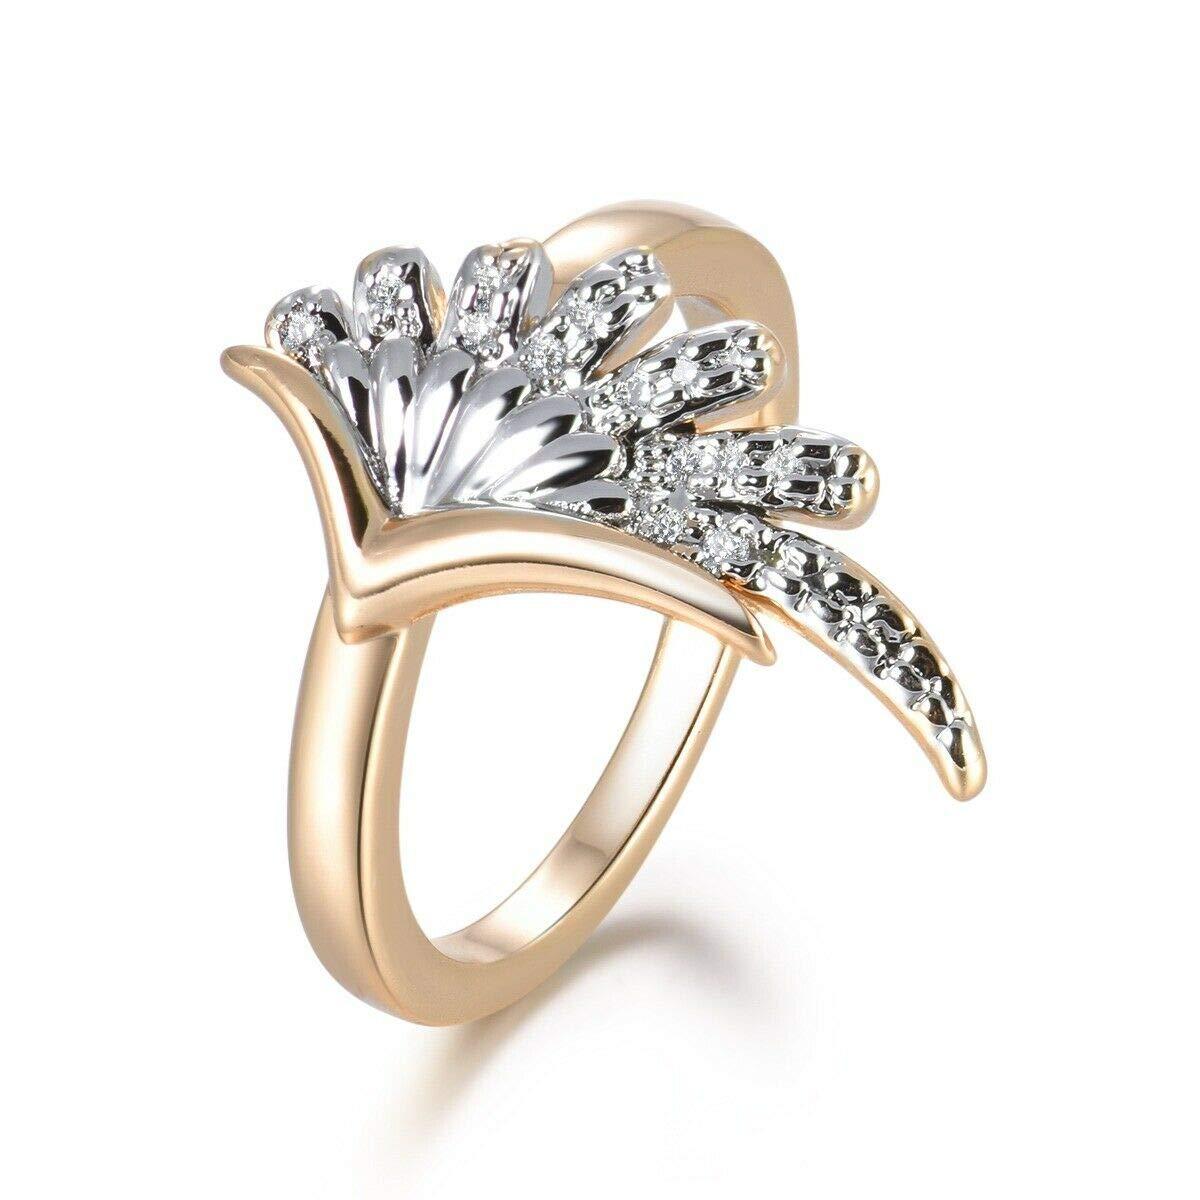 Bonitajewelry Women Rhinestone Gold Cocktail Ring Lady Fashion Party Accessories